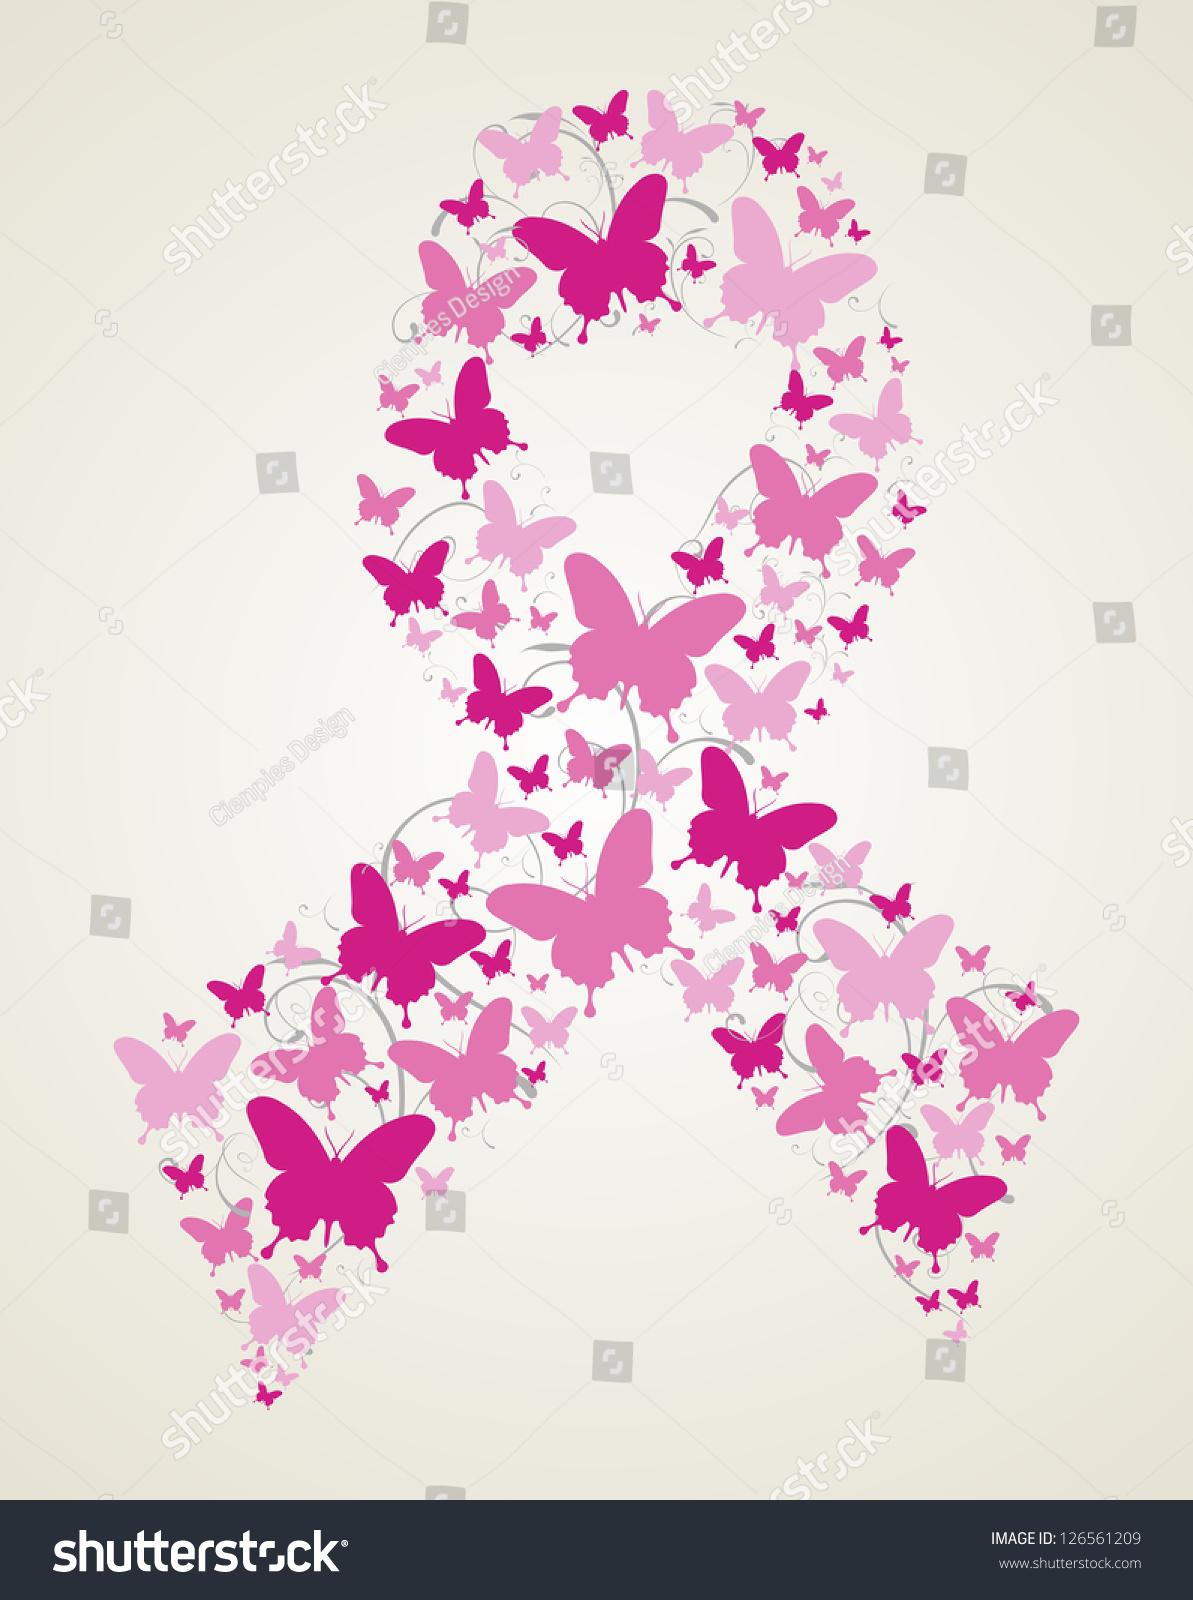 Pink Butterflies Breast Cancer Awareness Ribbon Stock Vector